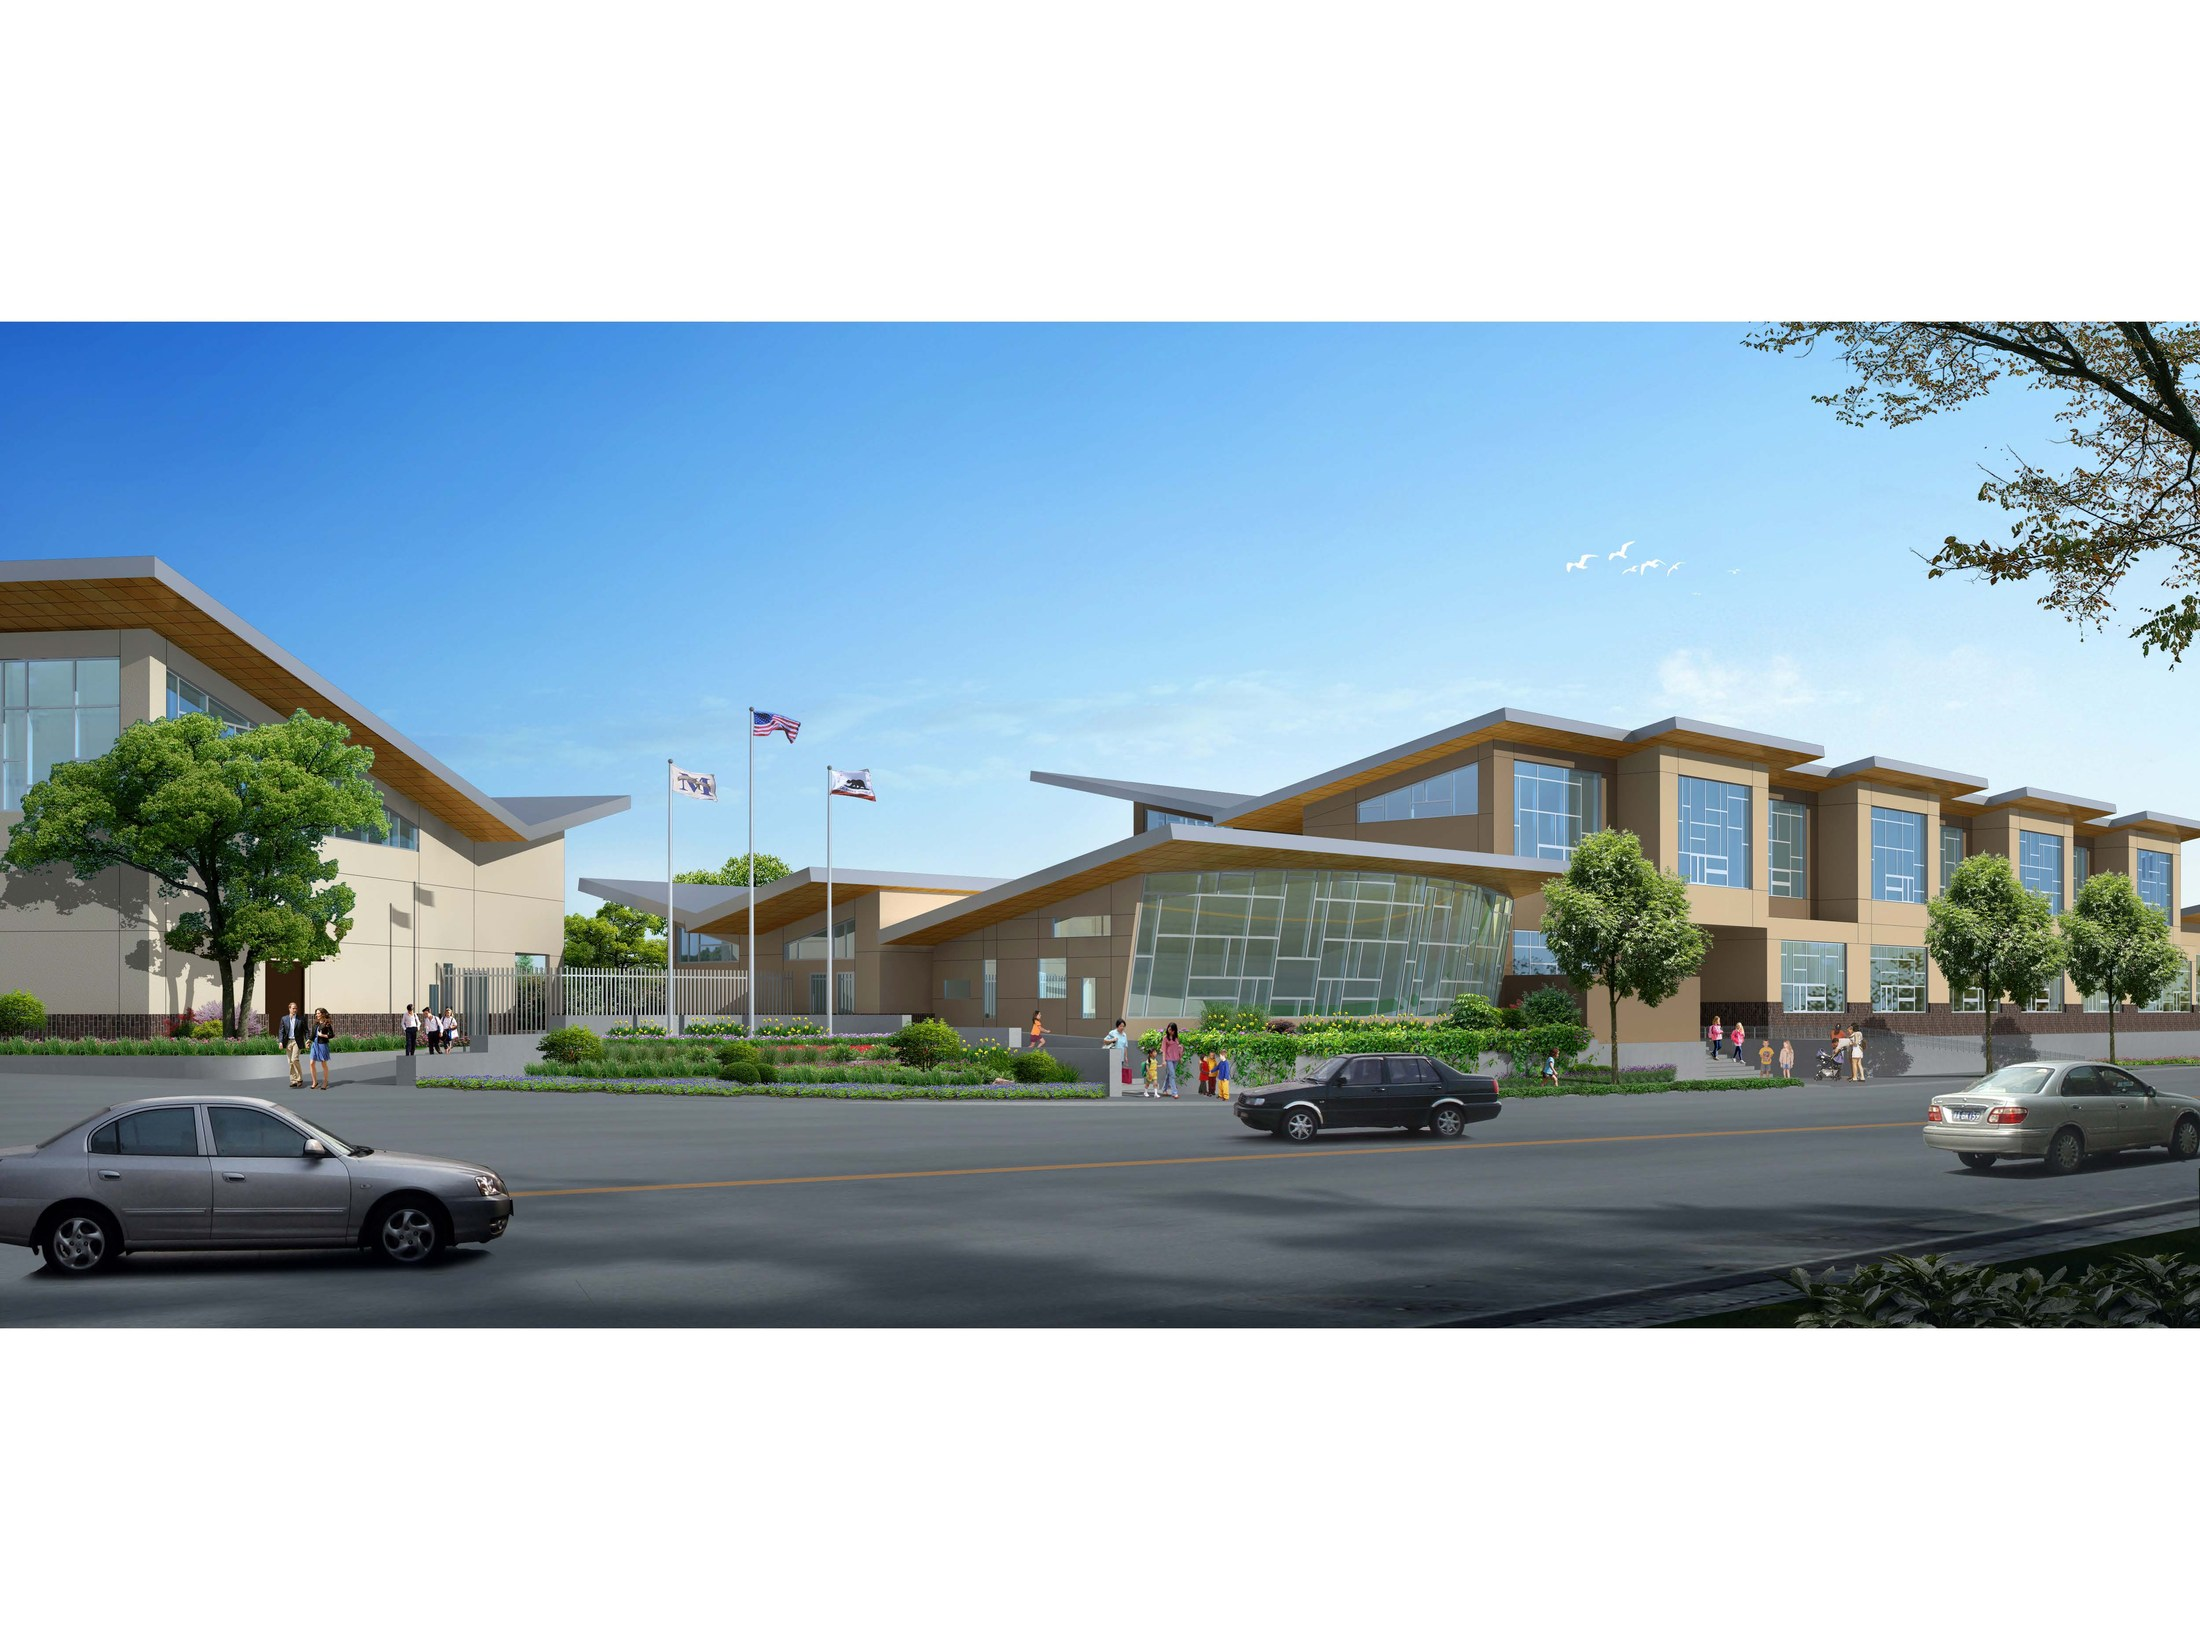 Rendering of future Marin School